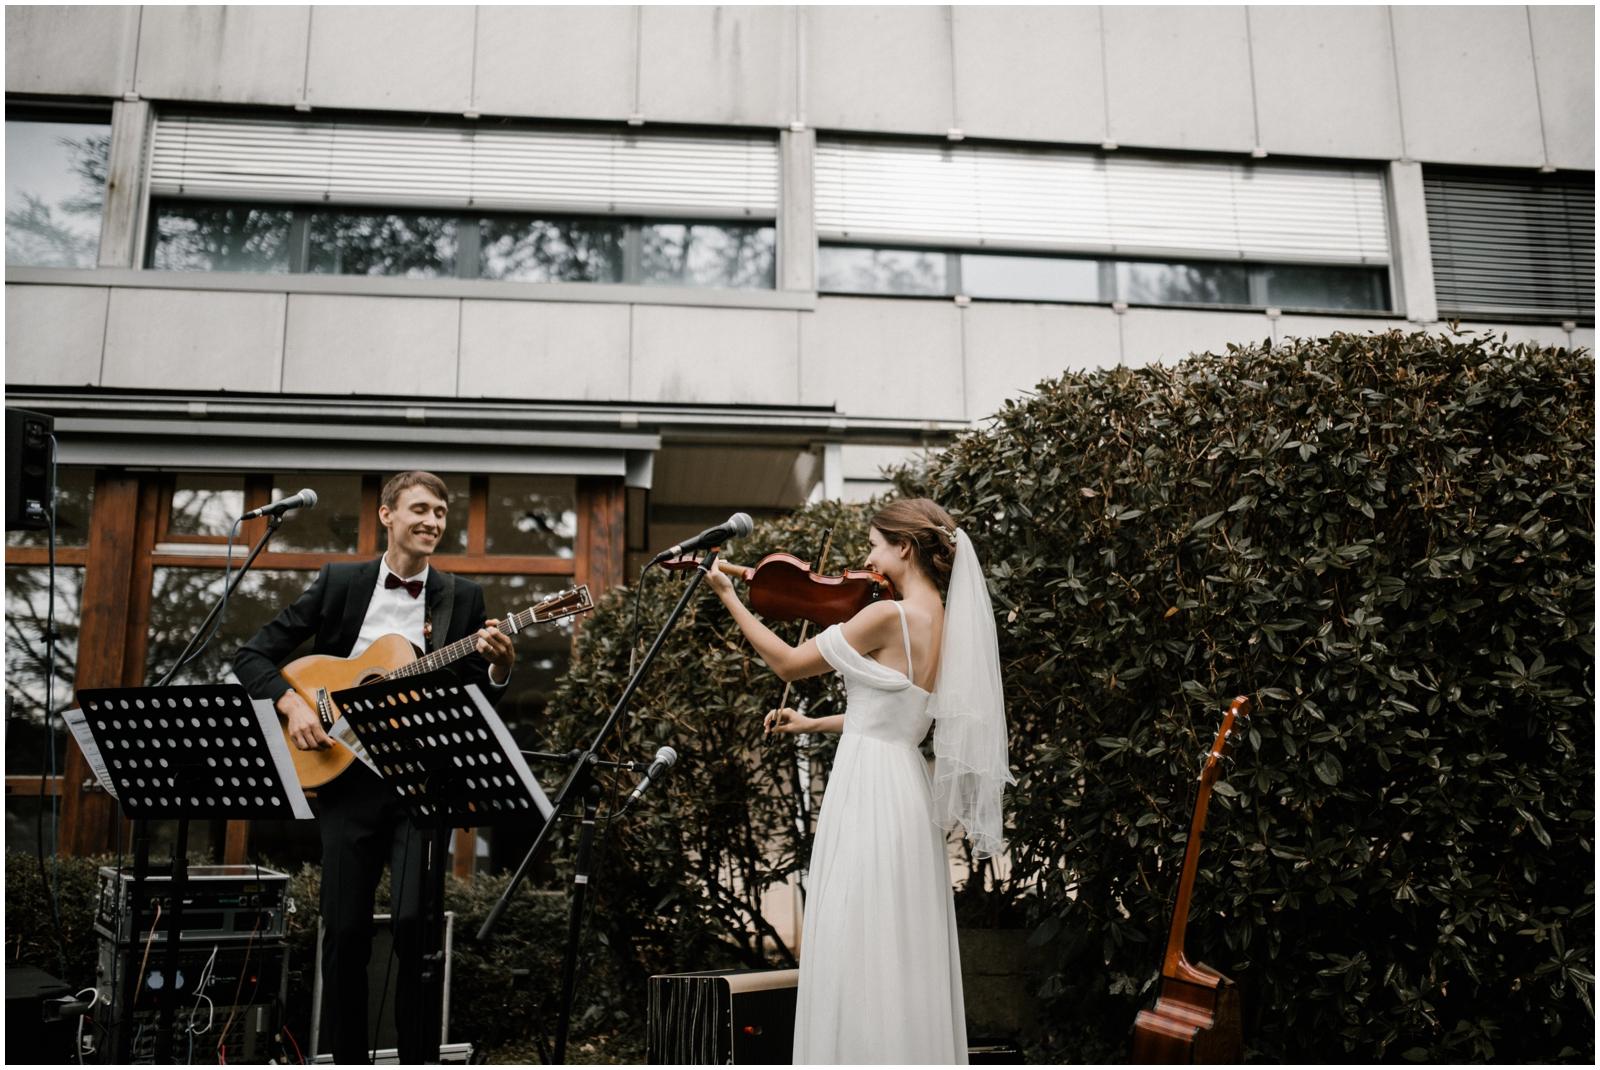 mirjam_thomas_wedding-437.jpg